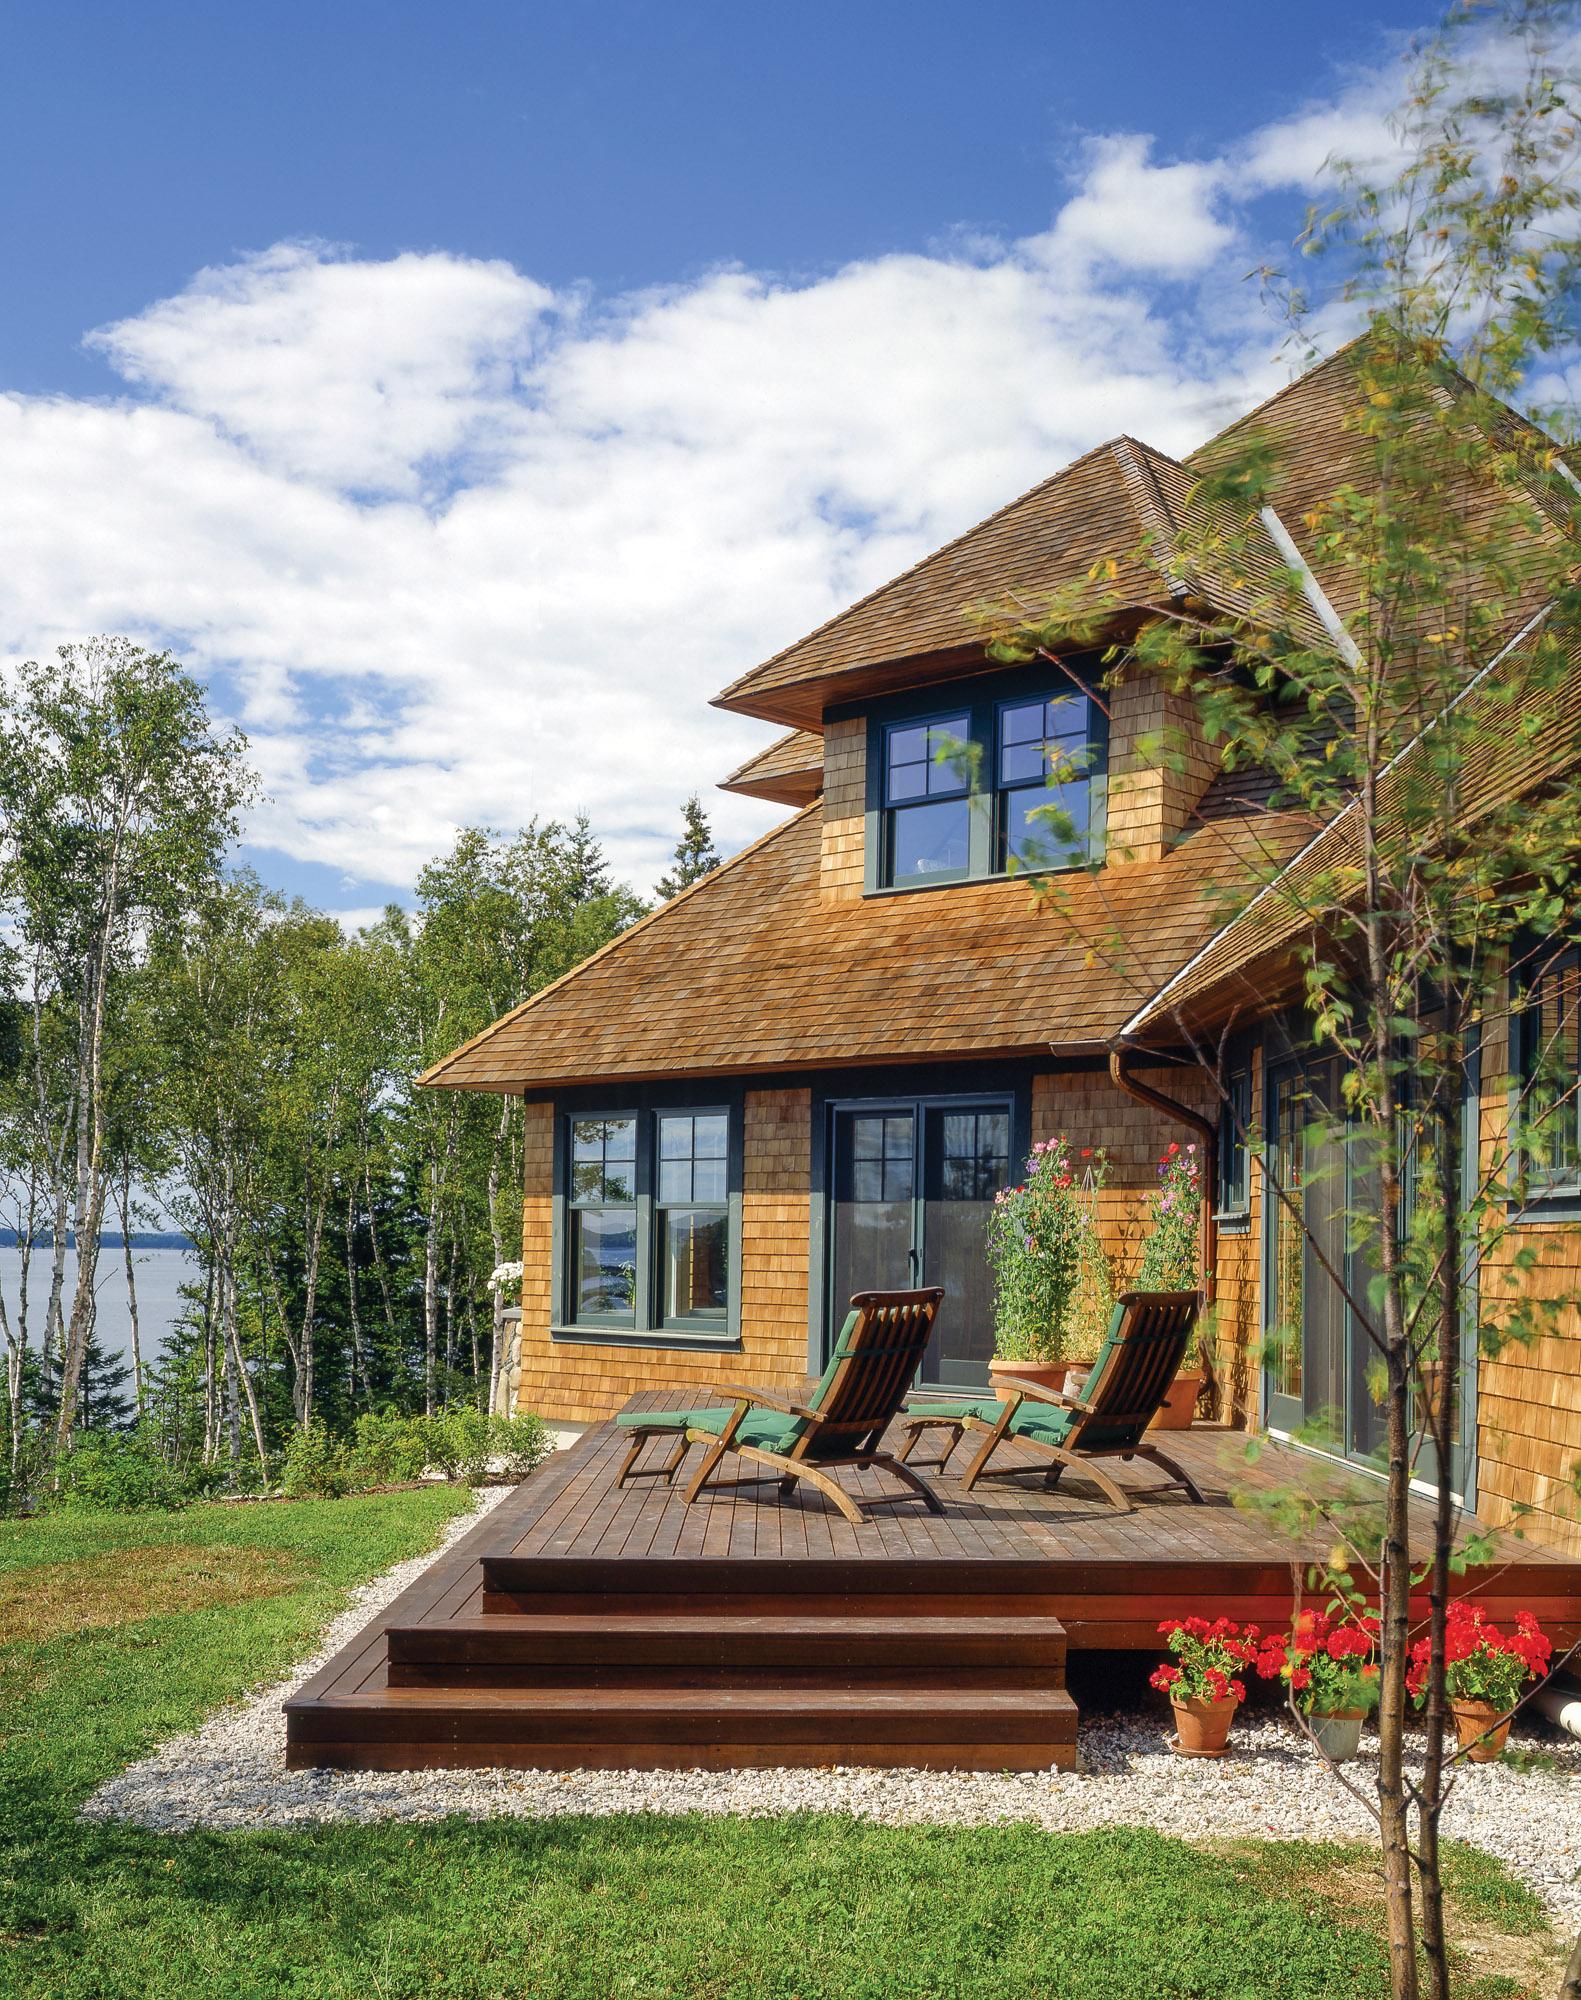 wood shingle house, backyard patio